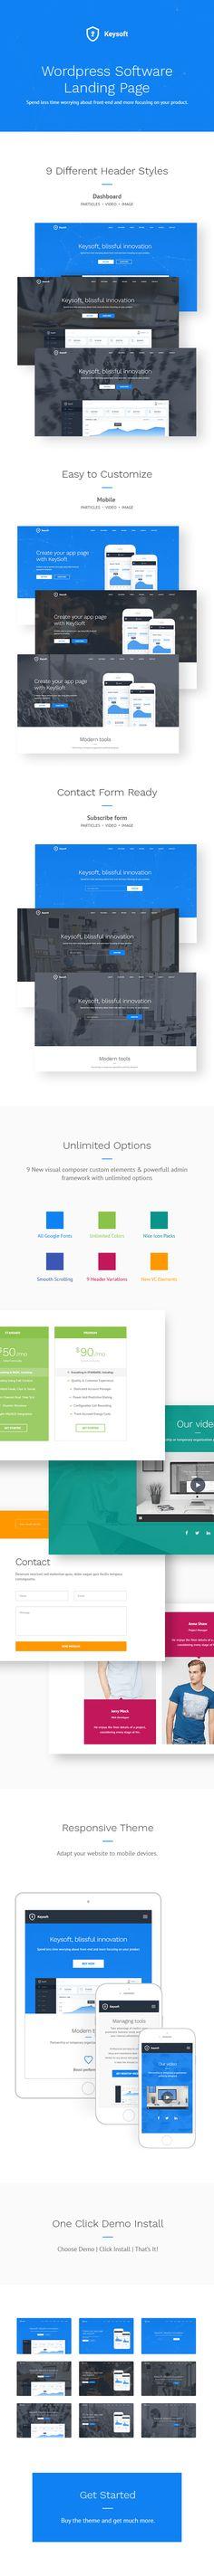 KeySoft – WordPress Software Landing Page